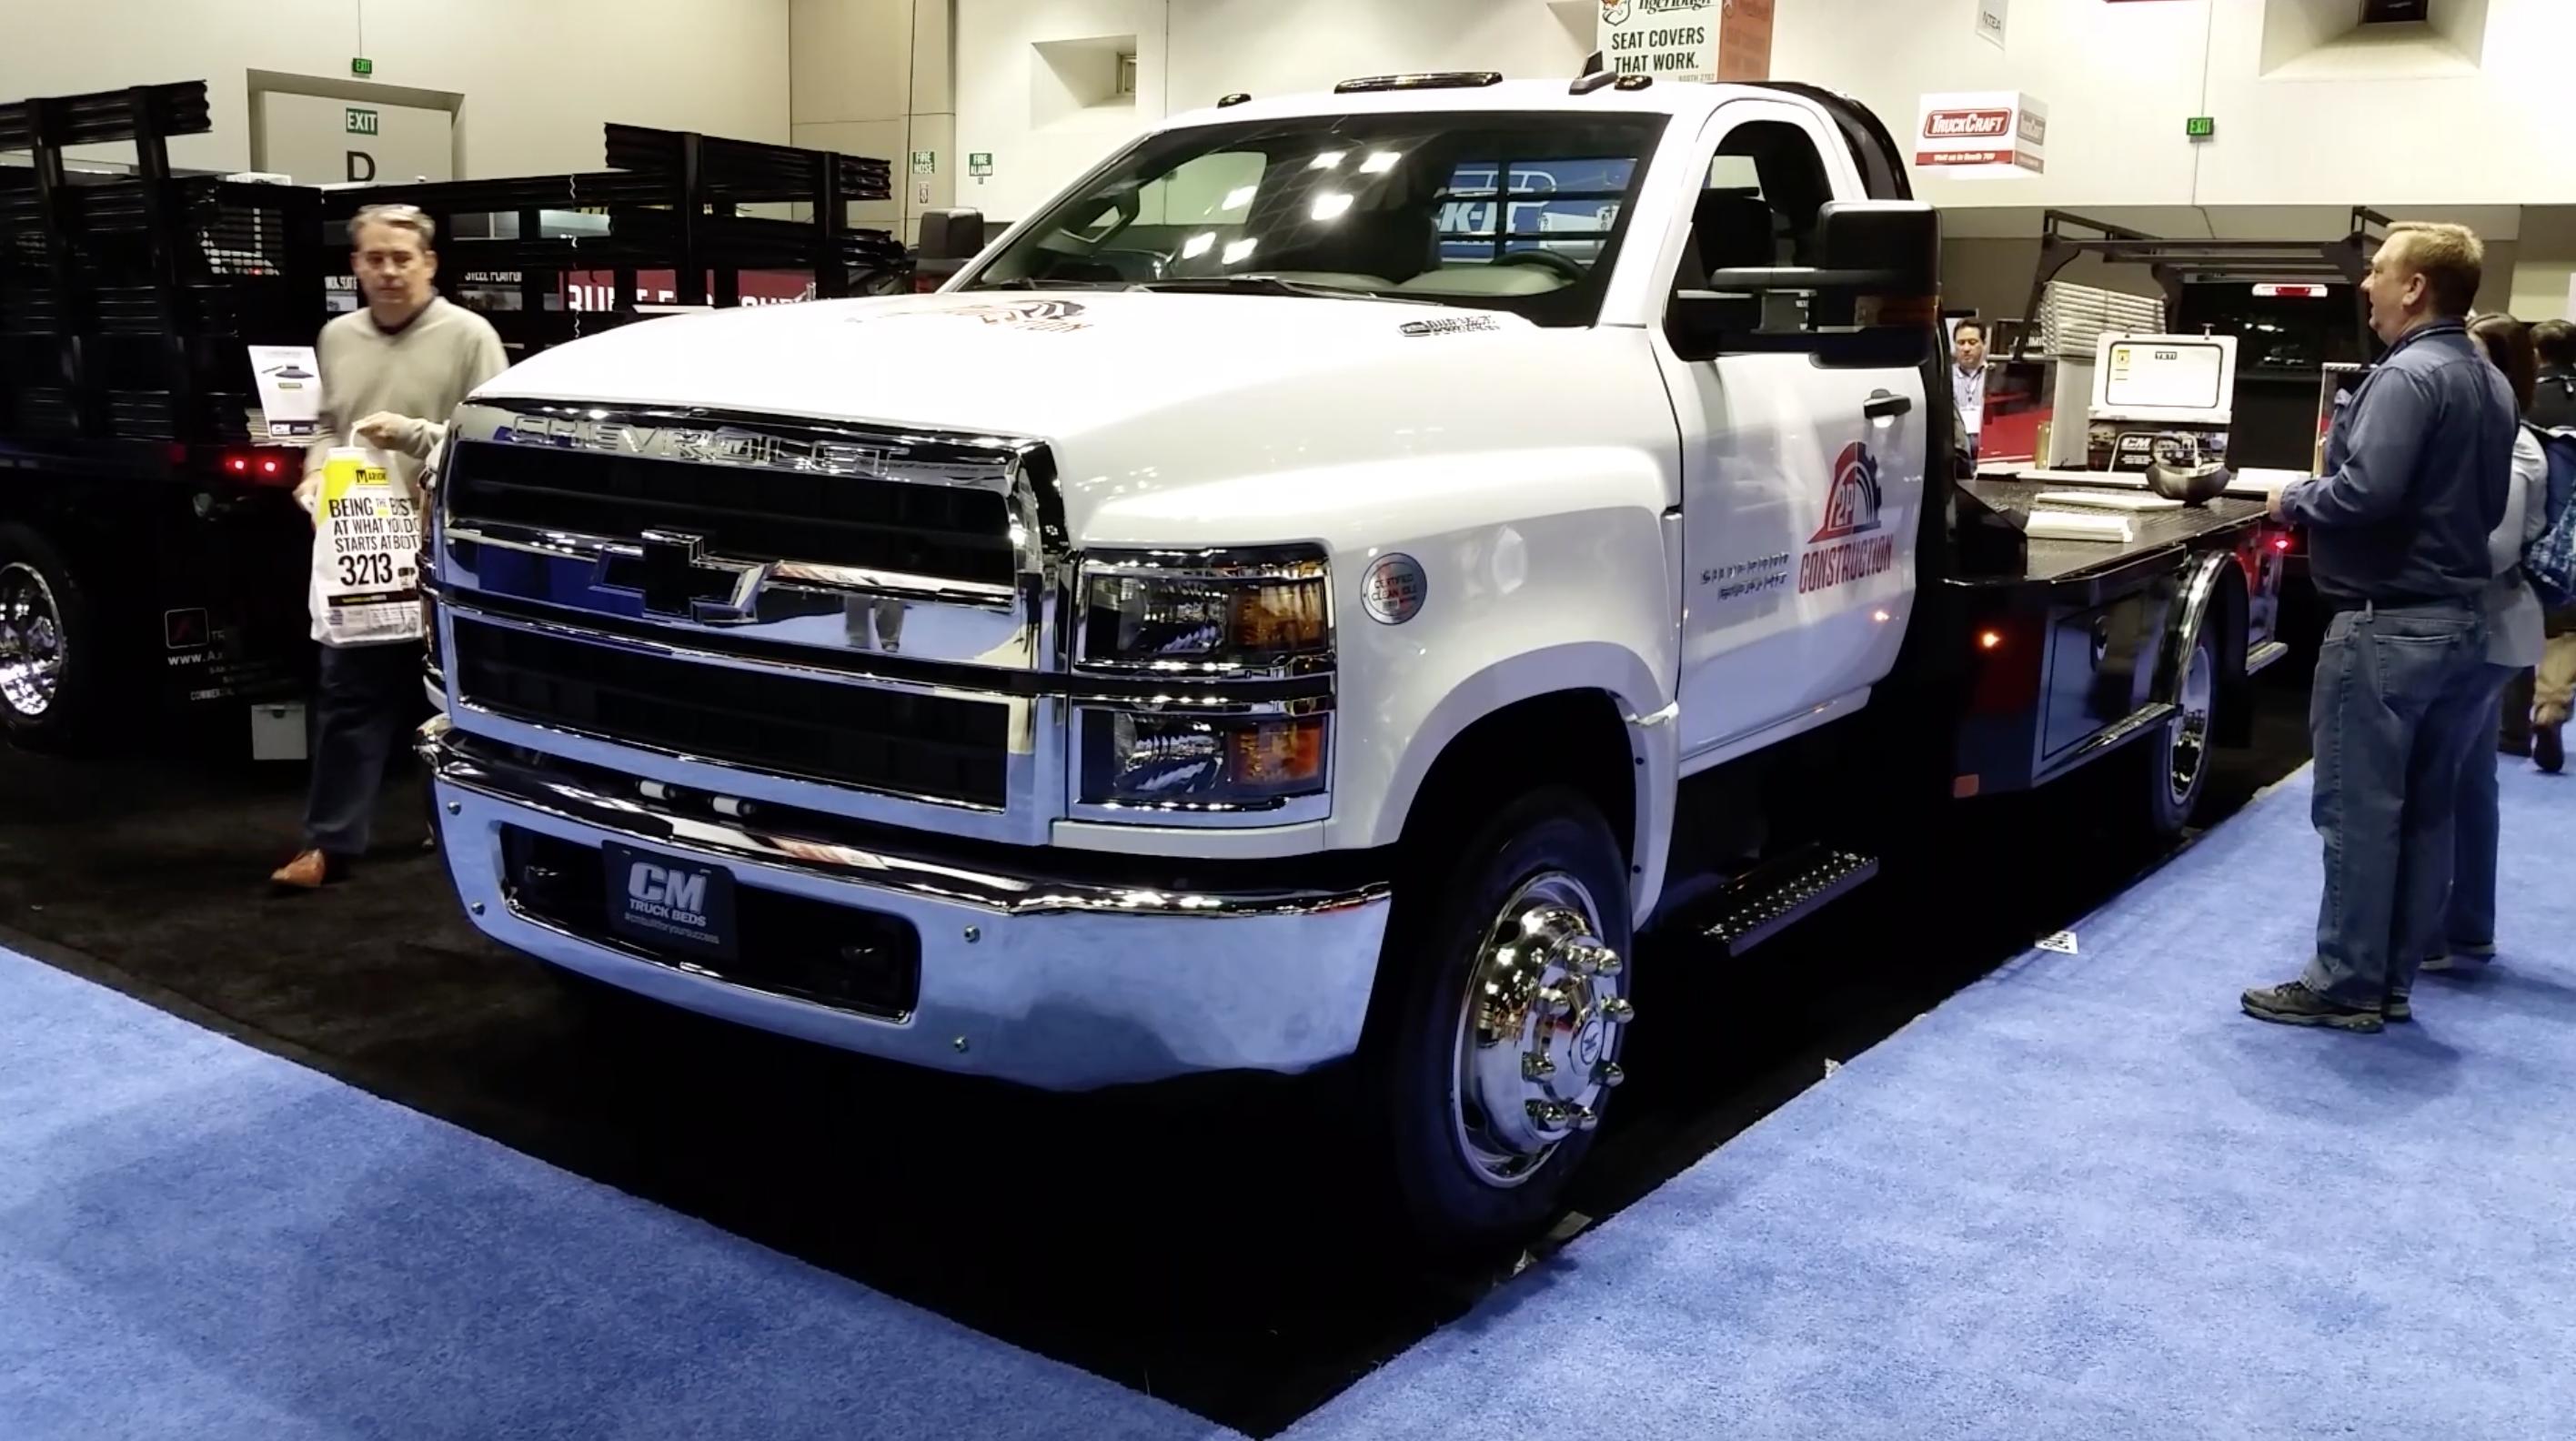 Cm Truck Beds Anticipates High Demand Of 2019 Chevy Silverado Medium Duty Builds Specially Designed Flatbed Medium Duty Work Truck Info